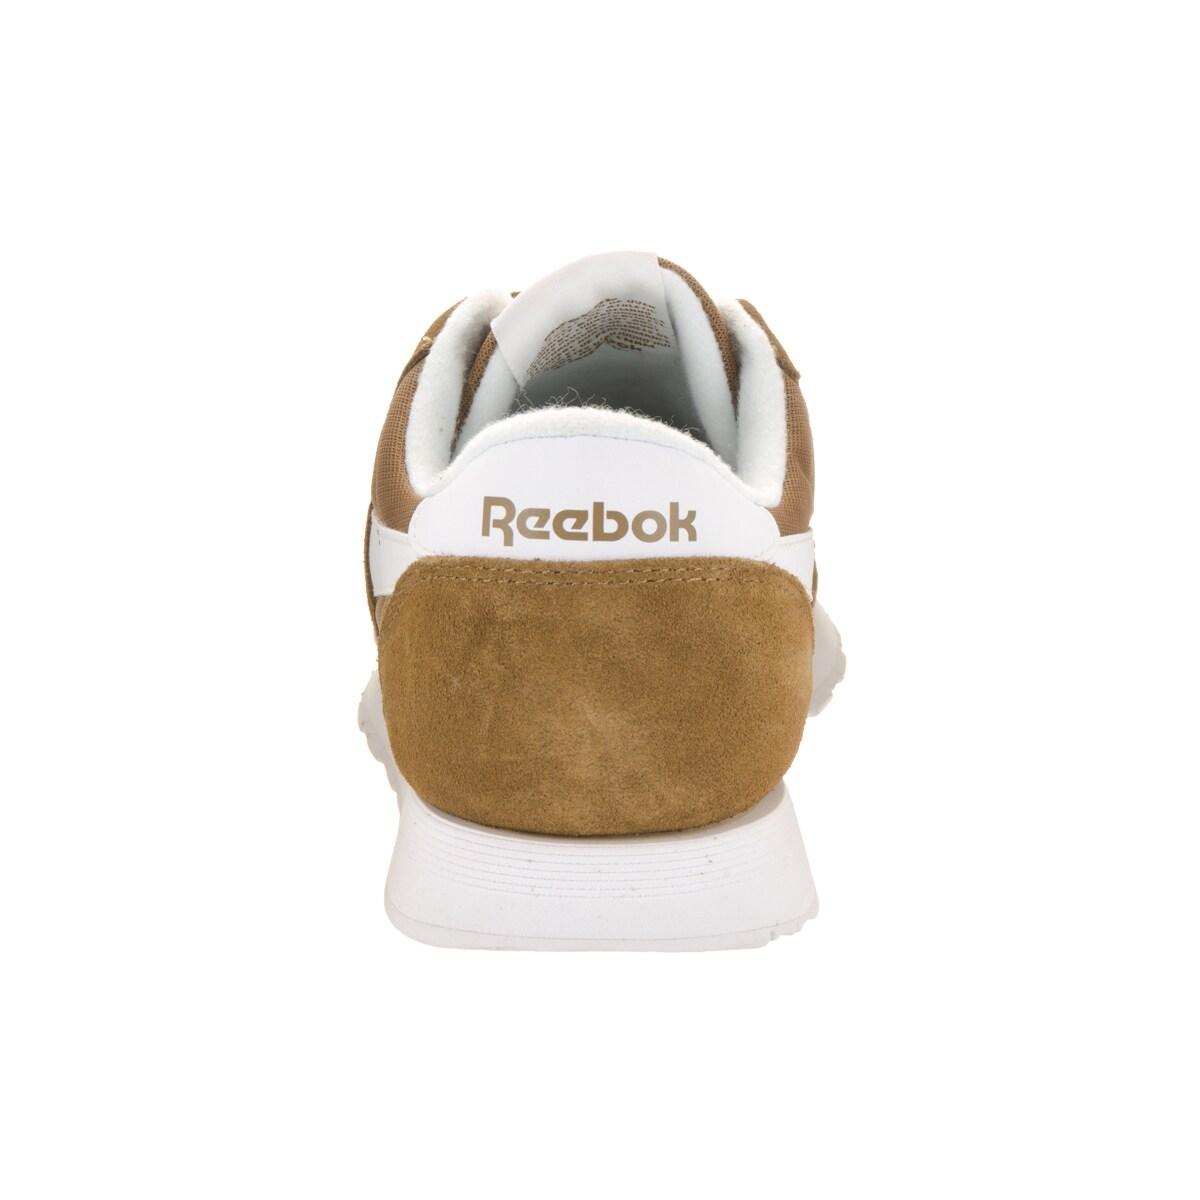 Shop Reebok Men s CL Nylon Classic Casual Shoe - Free Shipping Today -  Overstock.com - 13968761 31981a5eb